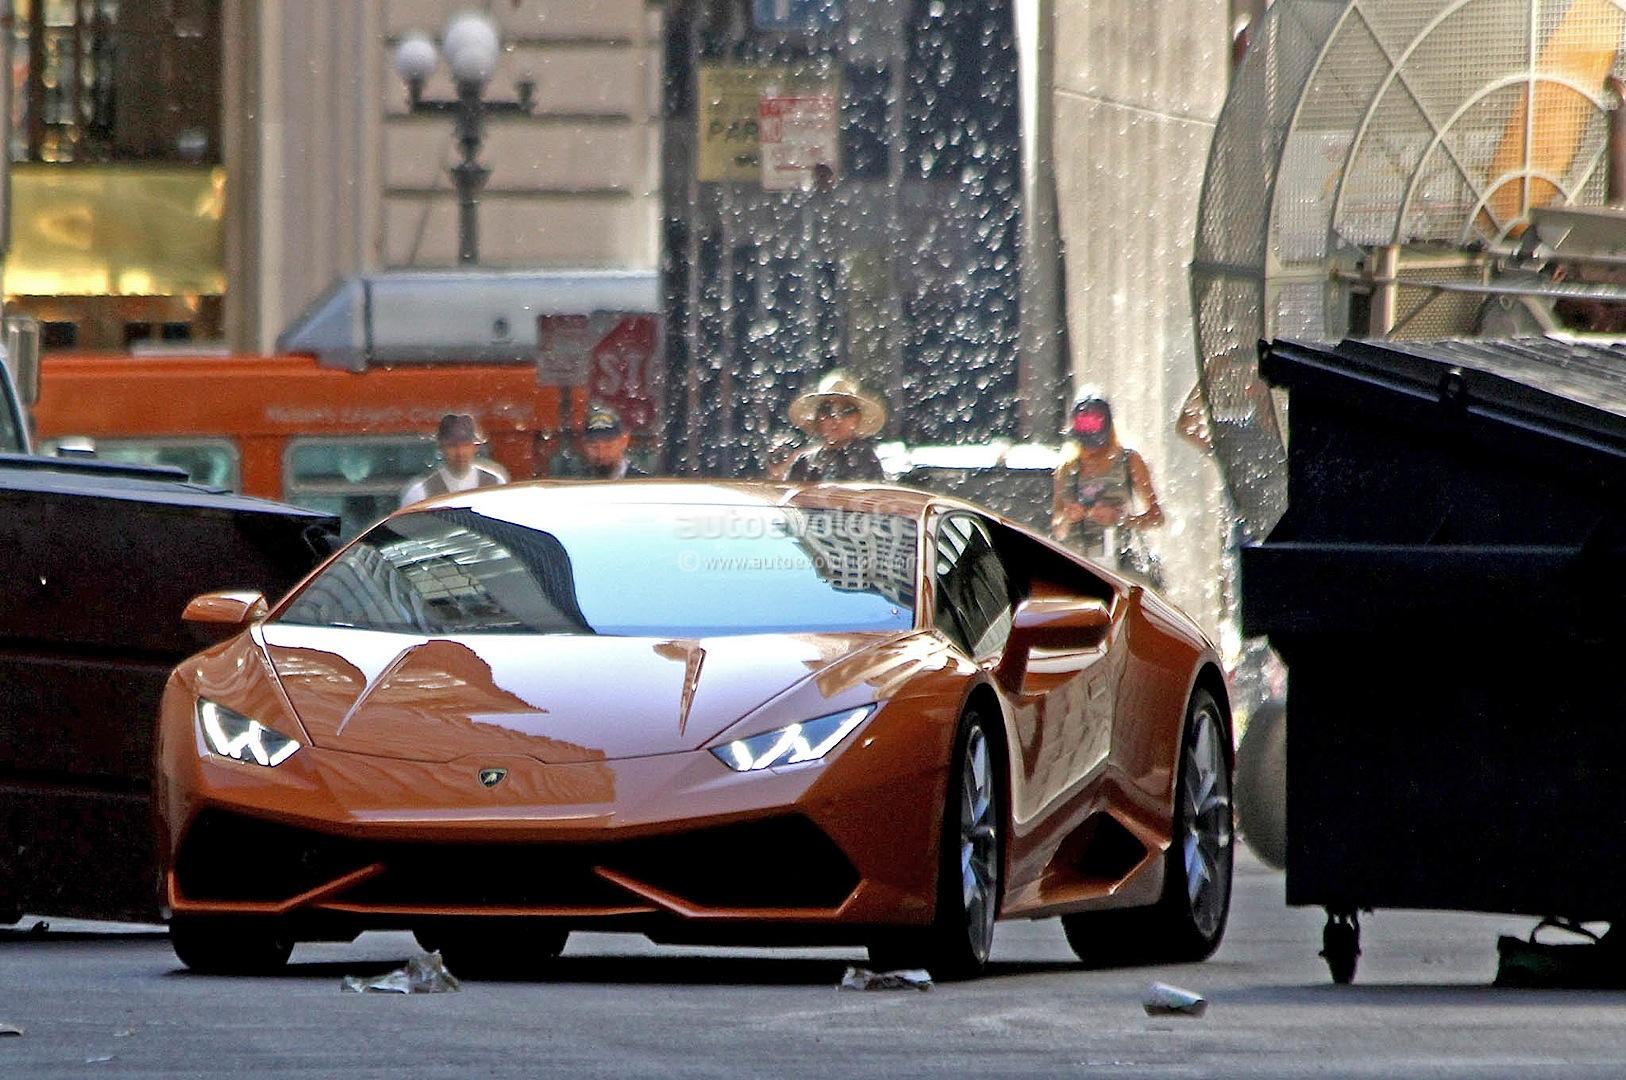 spyshots orange lamborghini huracan street racing in the us autoevolution. Black Bedroom Furniture Sets. Home Design Ideas